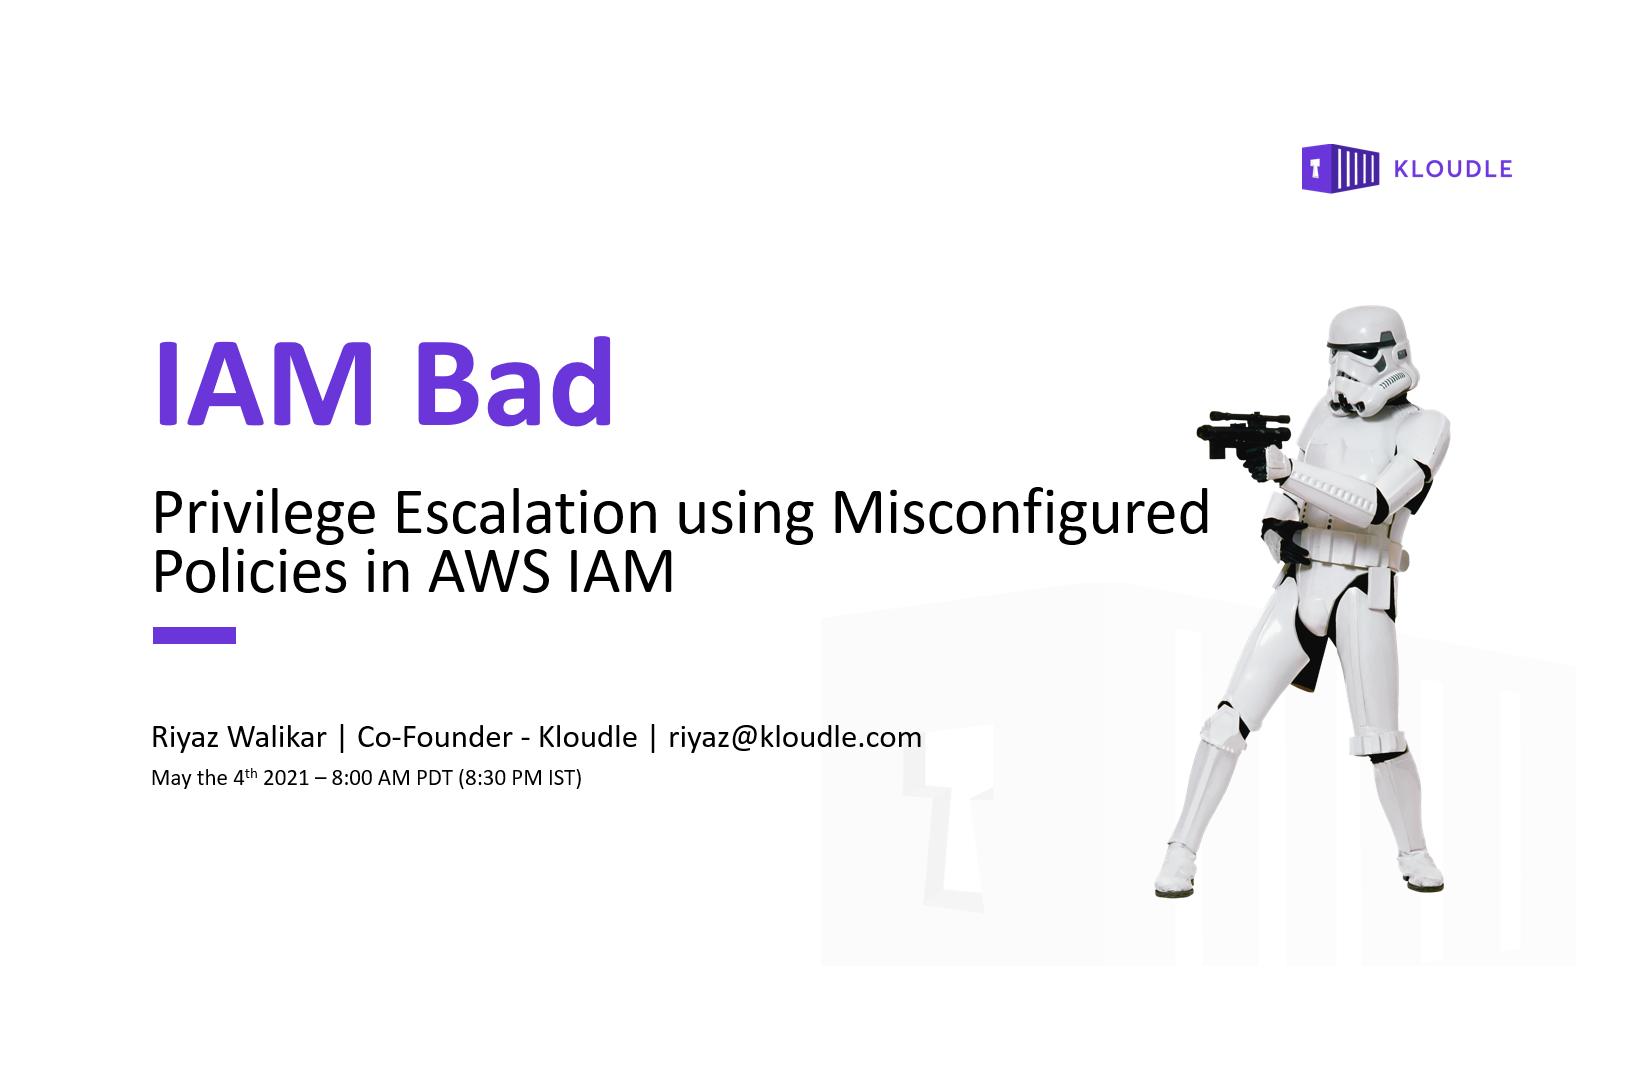 IAM Bad: Privilege Escalation using Misconfigured Policies in AWS IAM (Webinar)